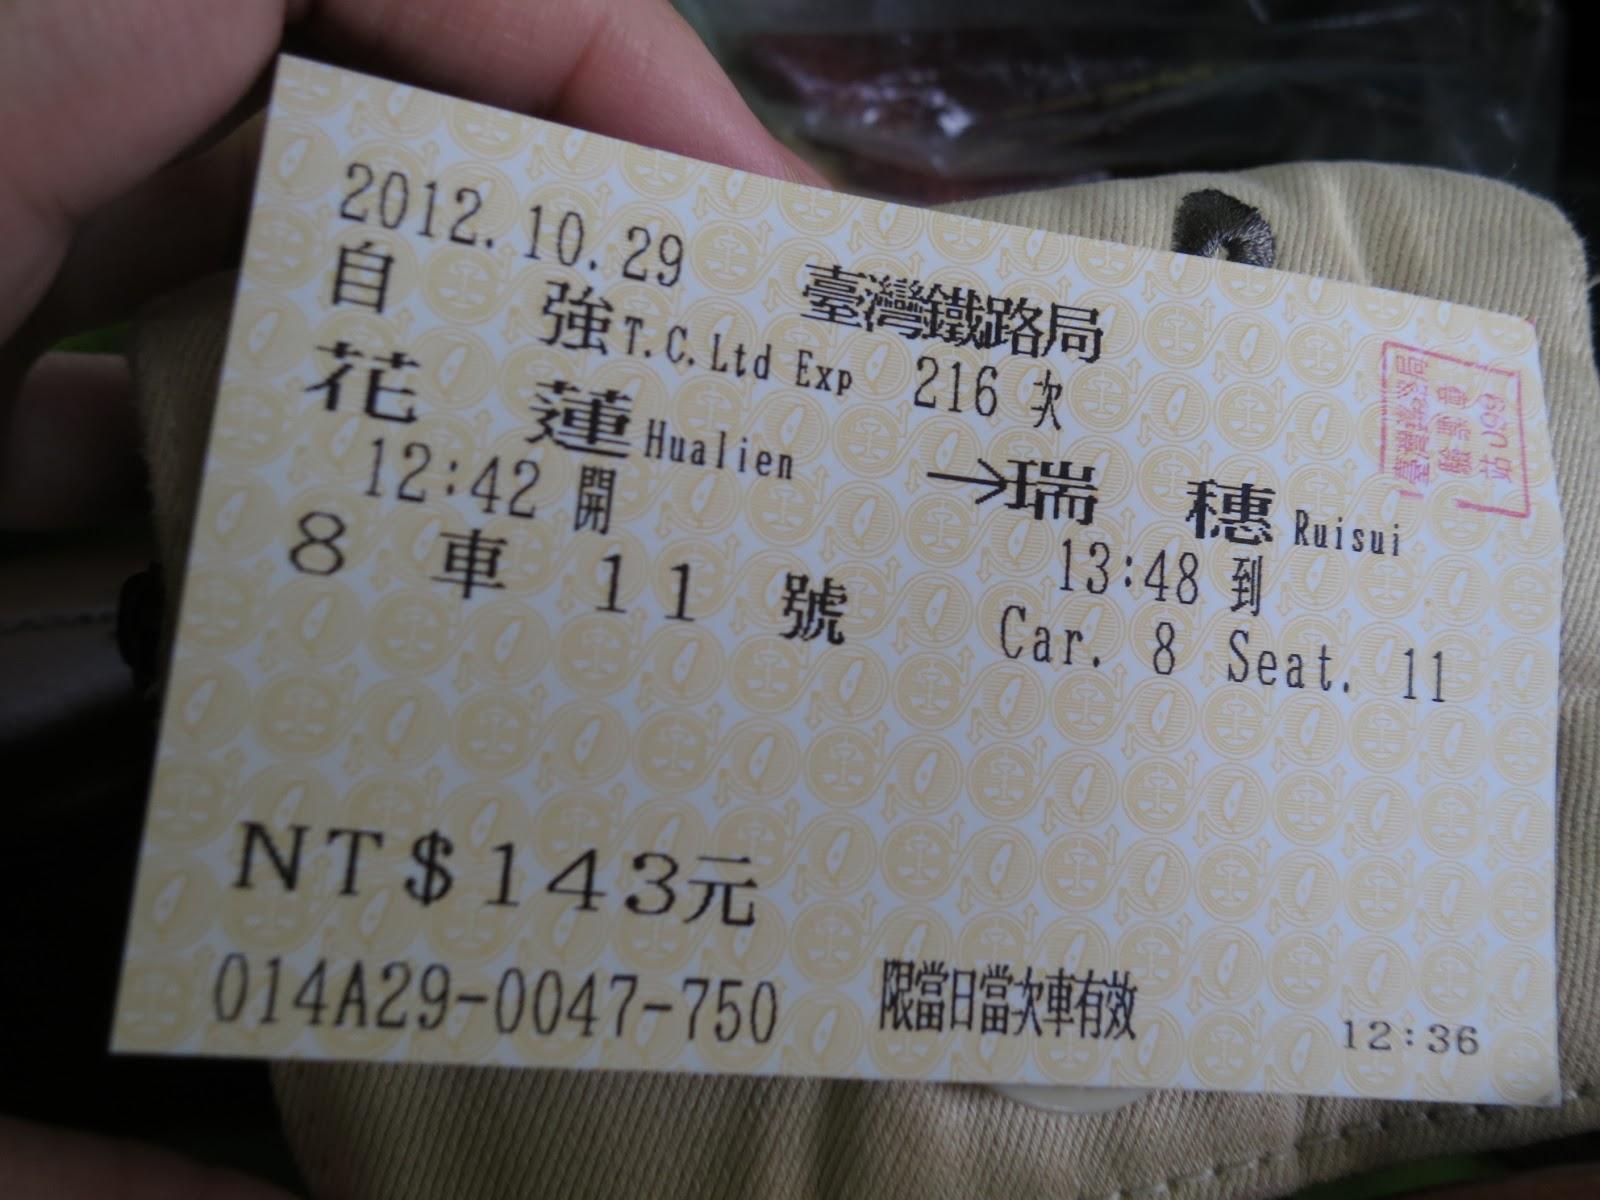 Hualien Mini Explorations: Day trip to Ruisui (瑞穗)